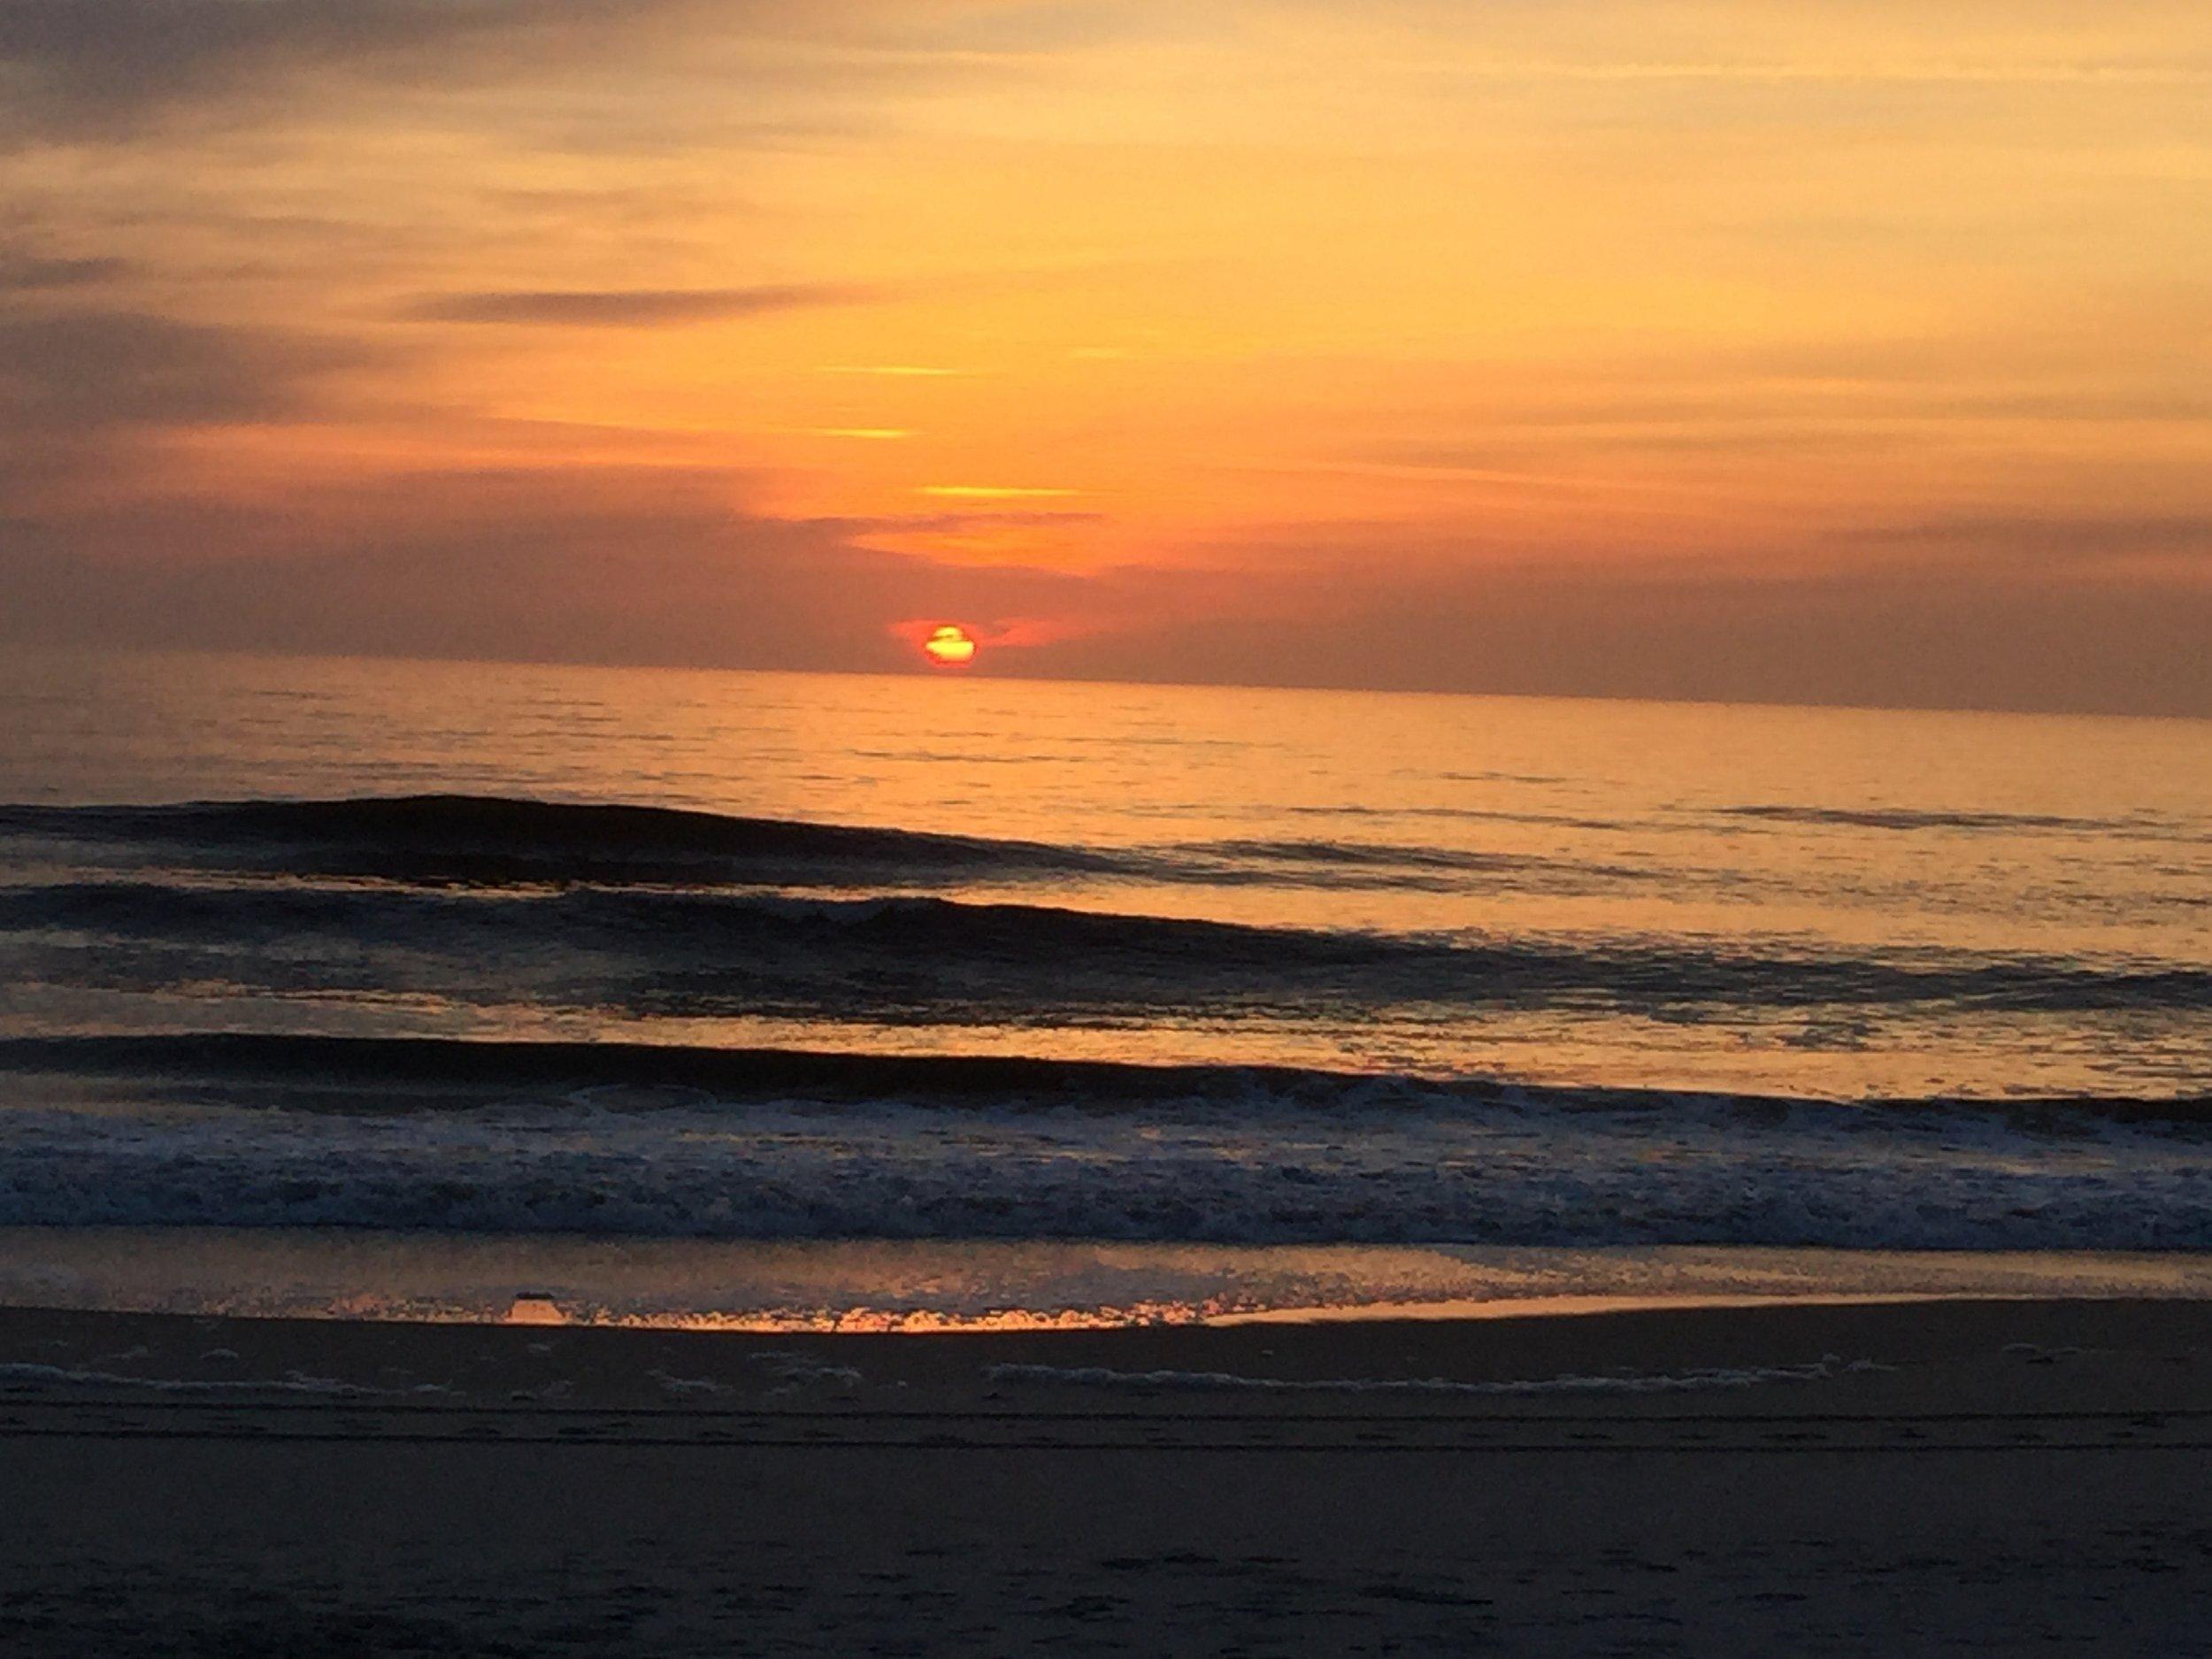 Sunrise at Carolina beach